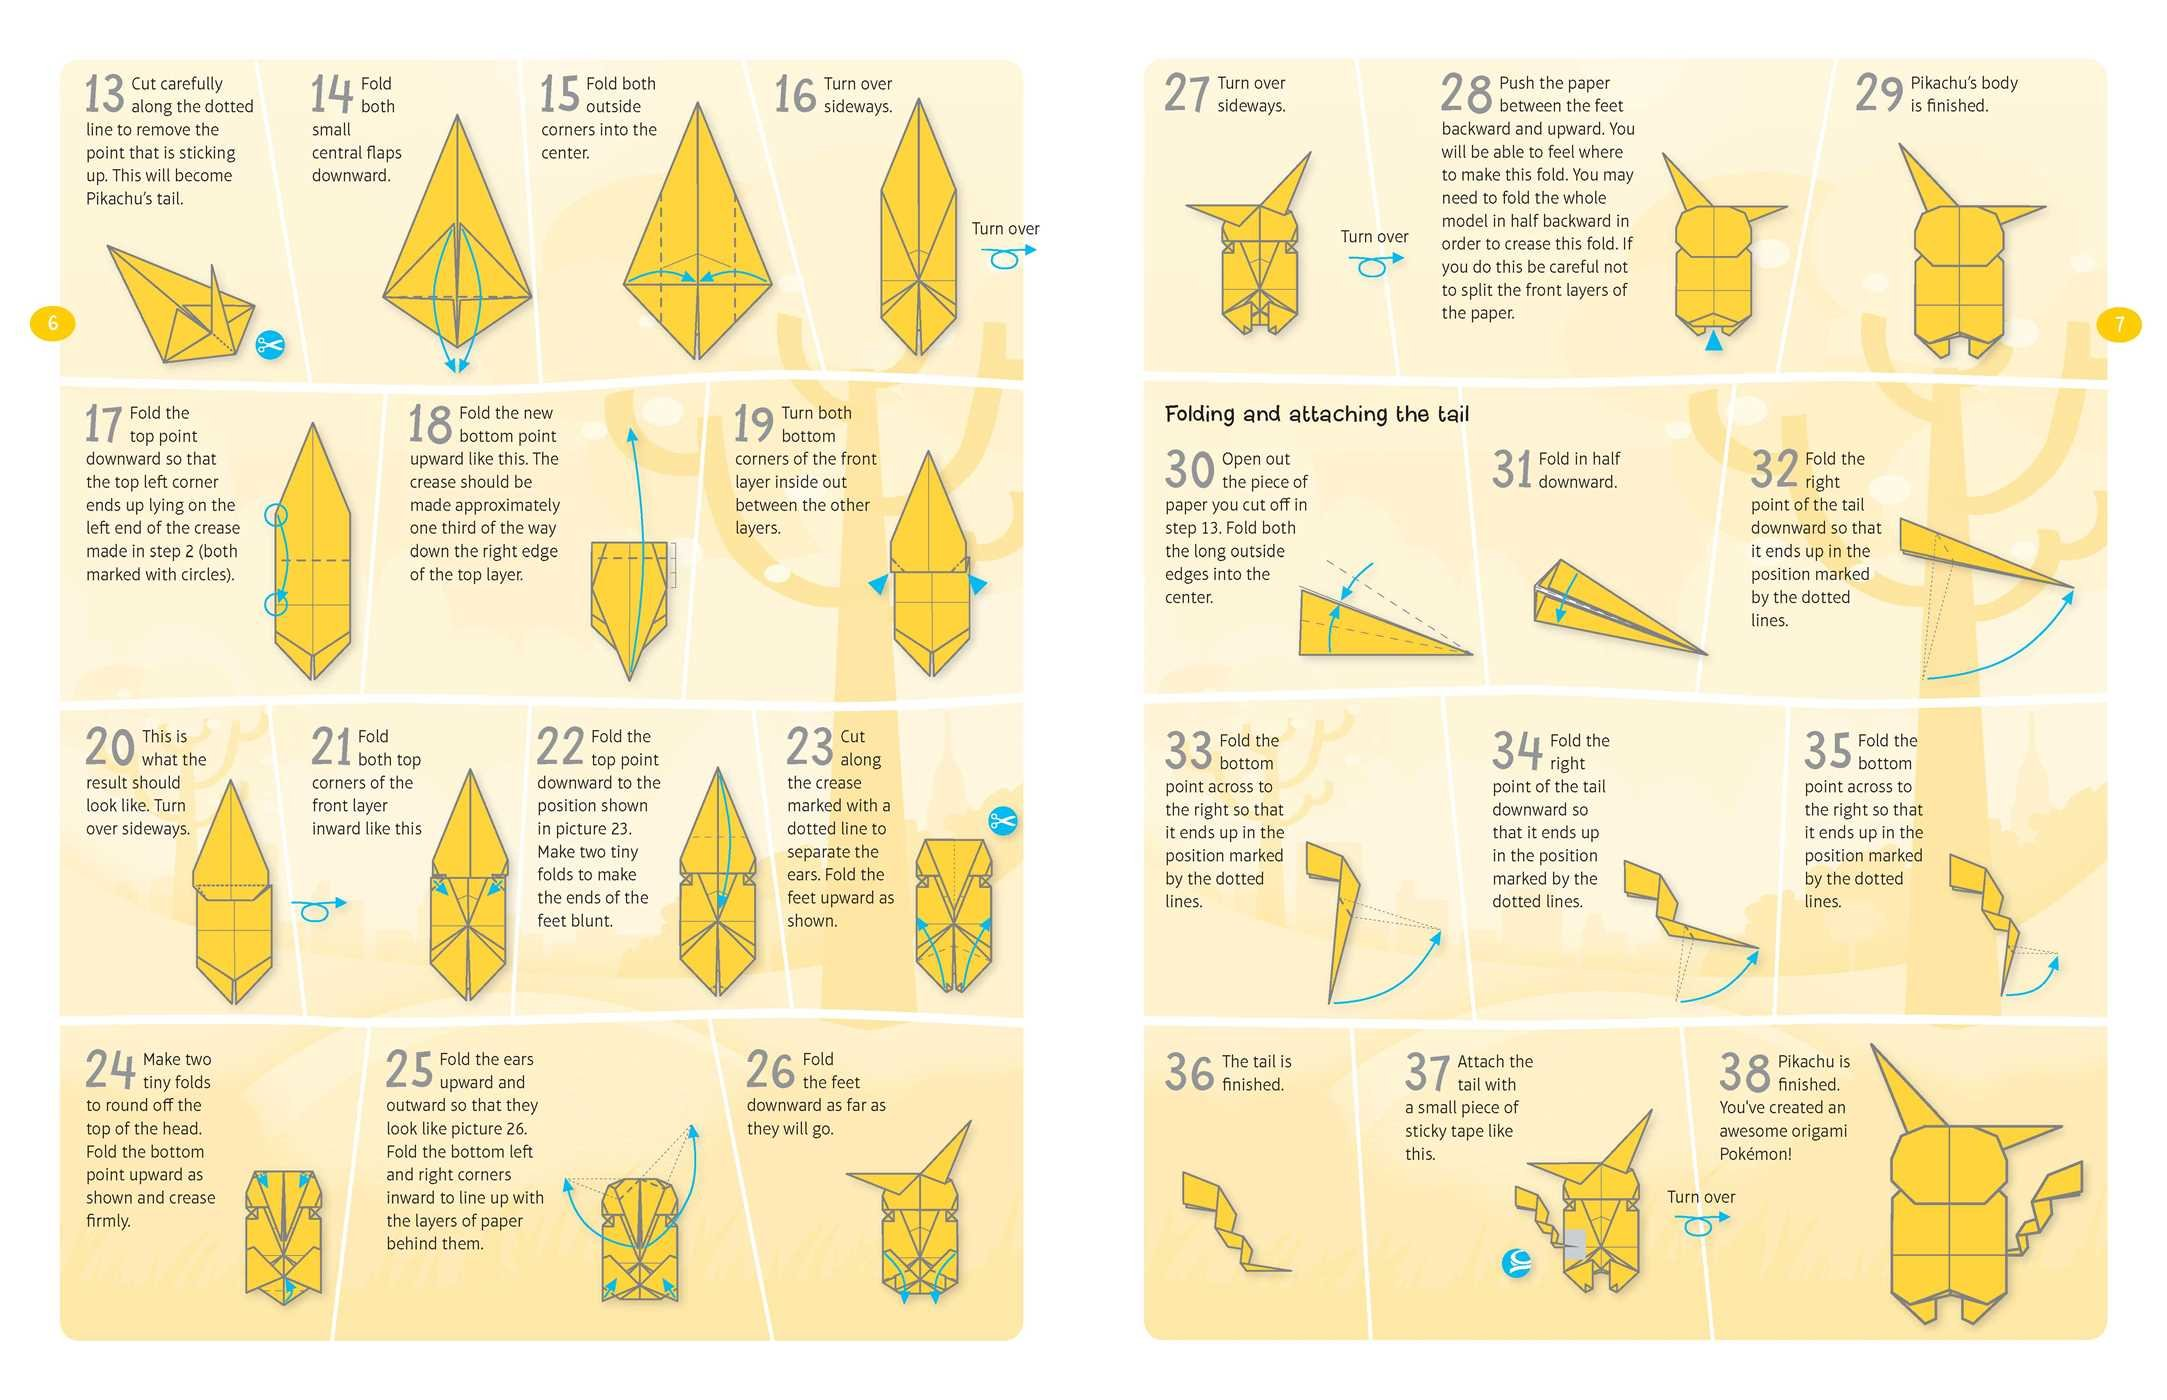 Pokemon origami fold your own pokemon pikachu press pokemon origami fold your own pokemon pikachu press 9781604381832 amazon books jeuxipadfo Images